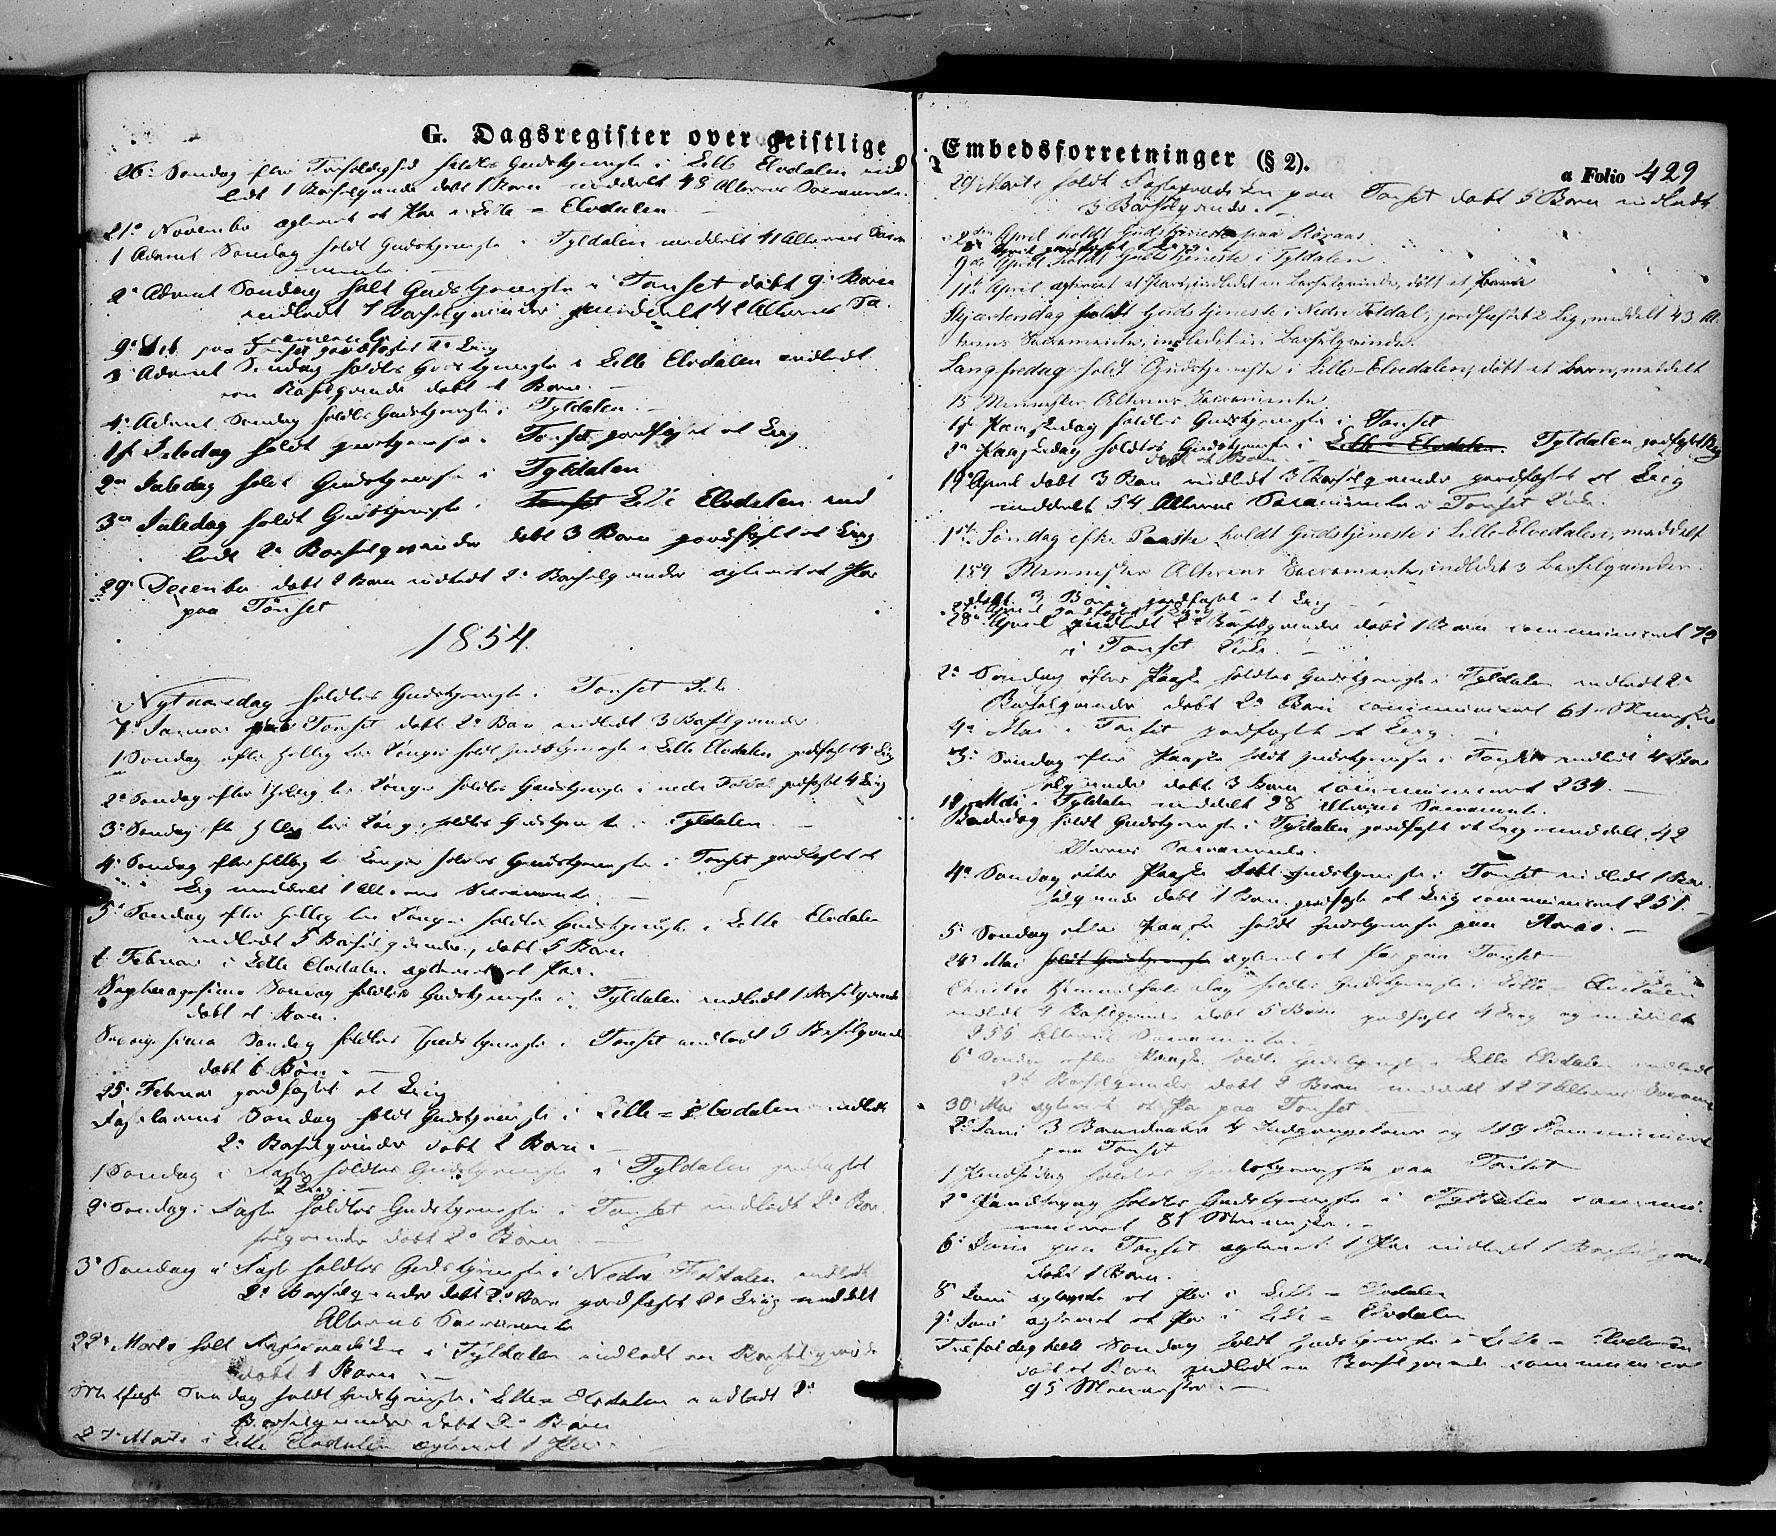 SAH, Tynset prestekontor, Ministerialbok nr. 20, 1848-1862, s. 429